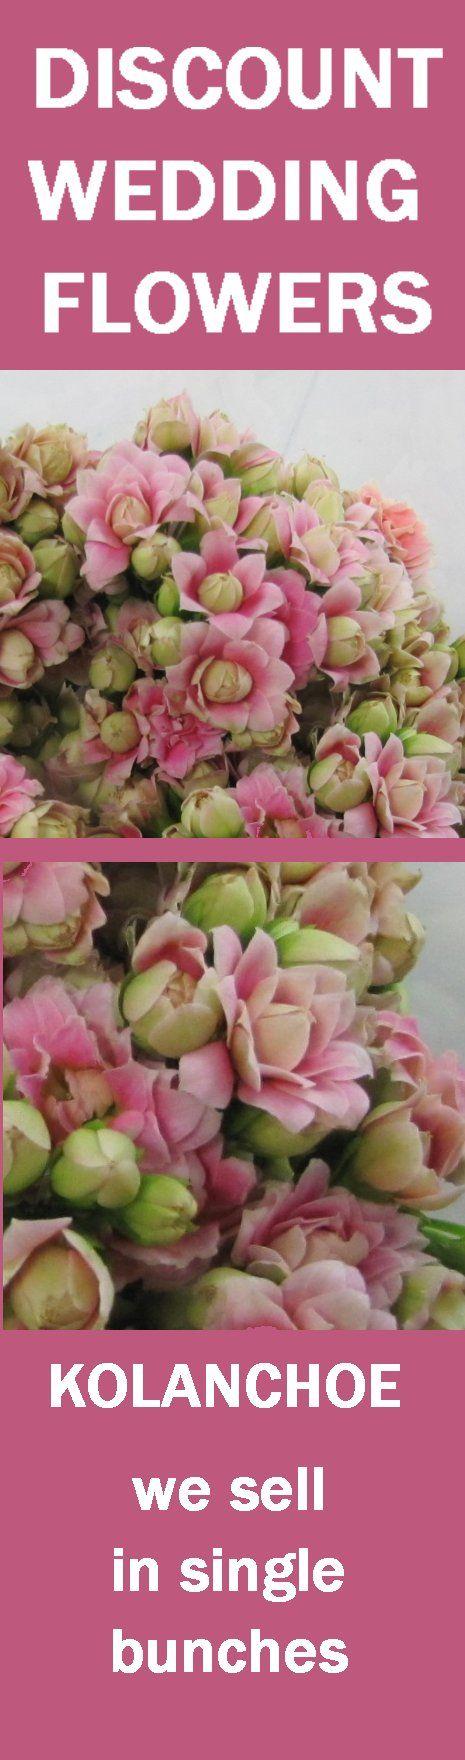 31 Best Images About Kolanchoe Wedding Flowers On Pinterest